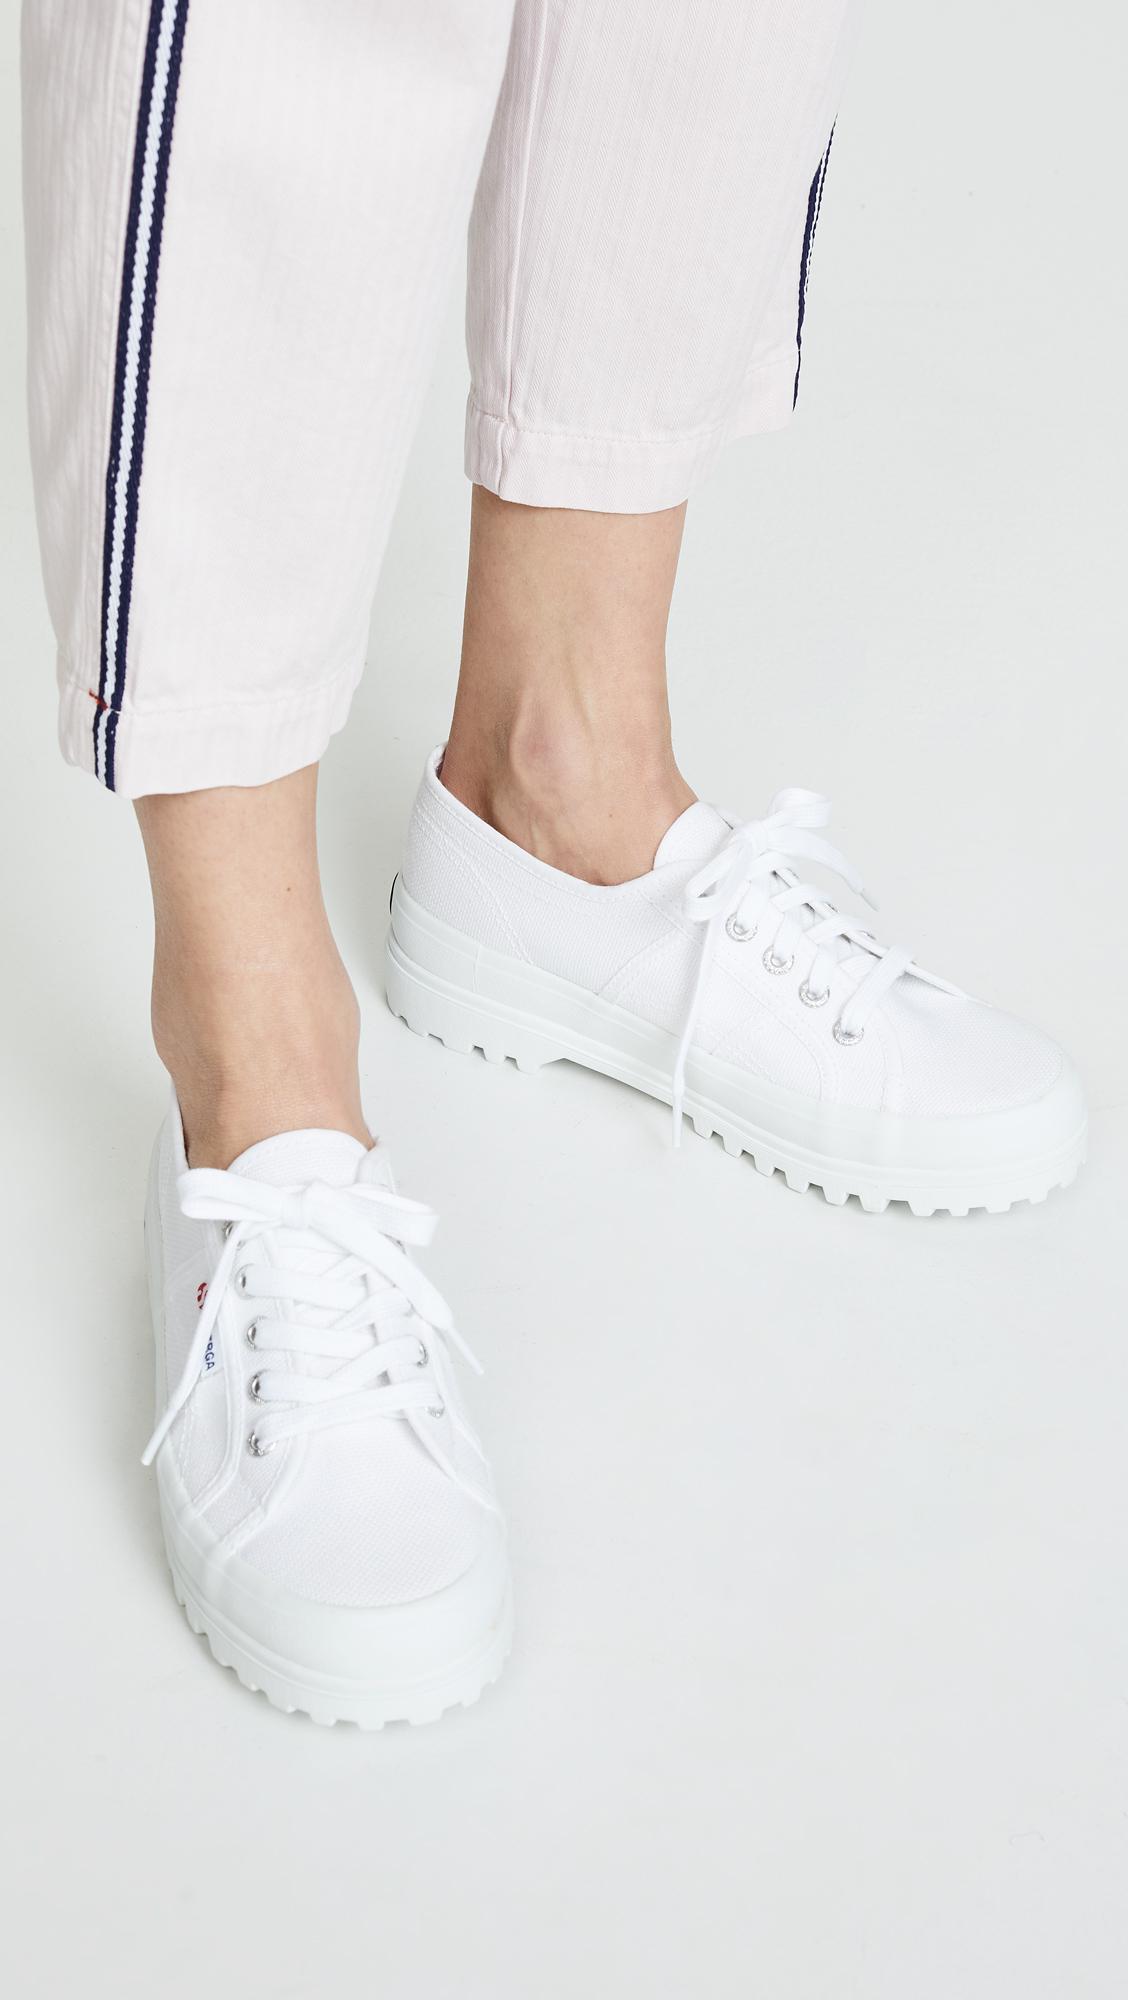 2555 Cotu Lug Sole Sneakers in White